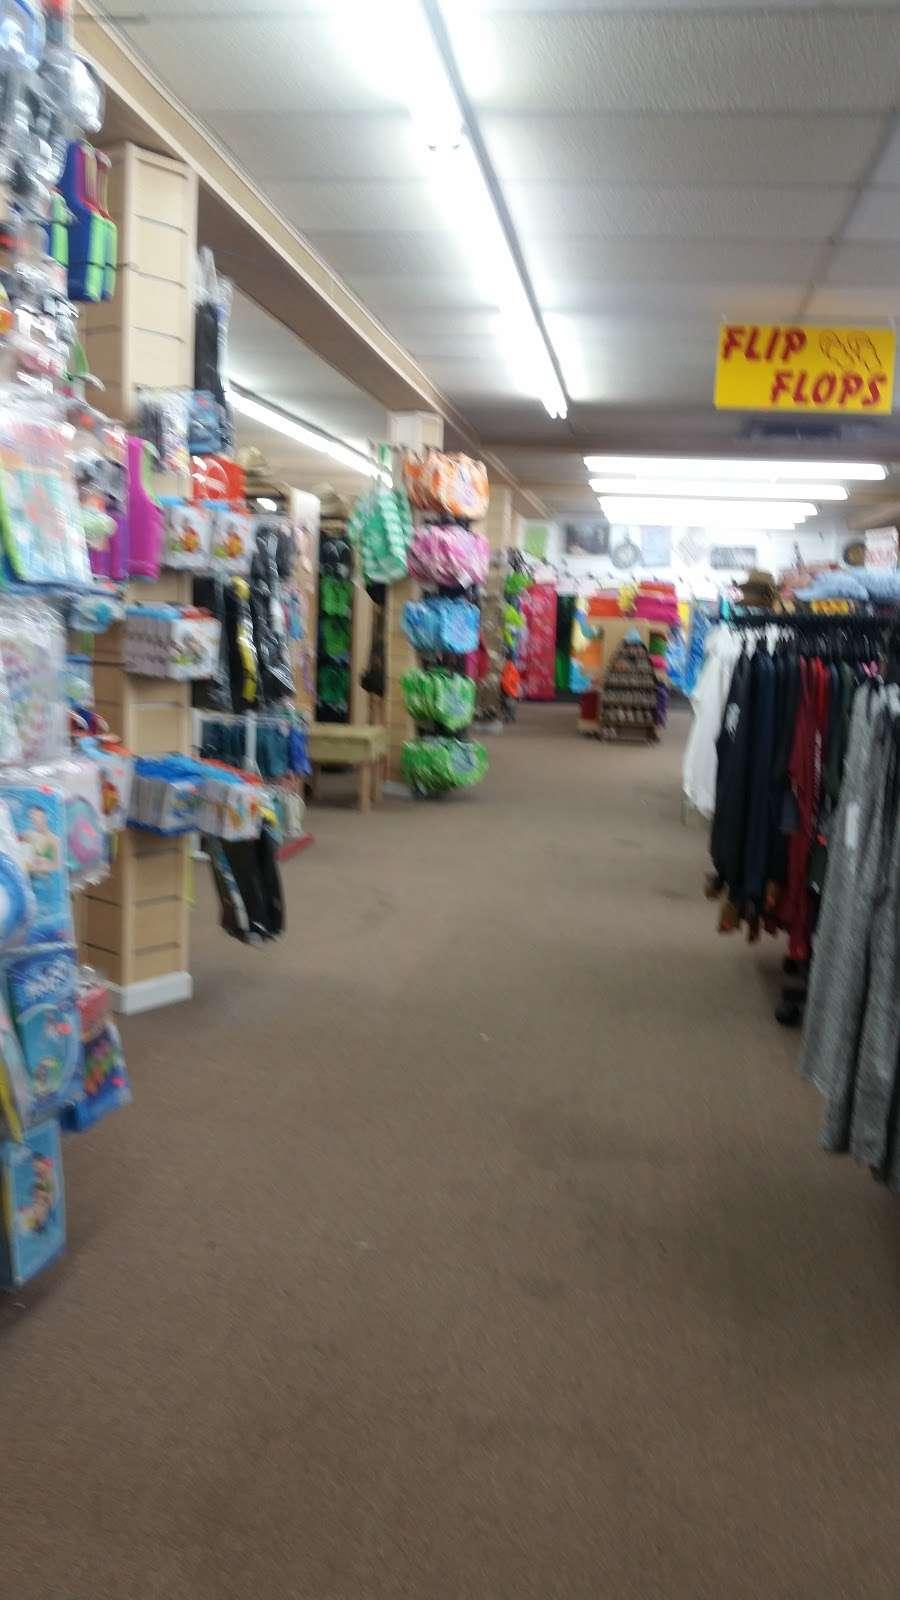 Sunsations - clothing store  | Photo 6 of 9 | Address: 2210 Long Beach Blvd, Ship Bottom, NJ 08008, USA | Phone: (609) 361-6264